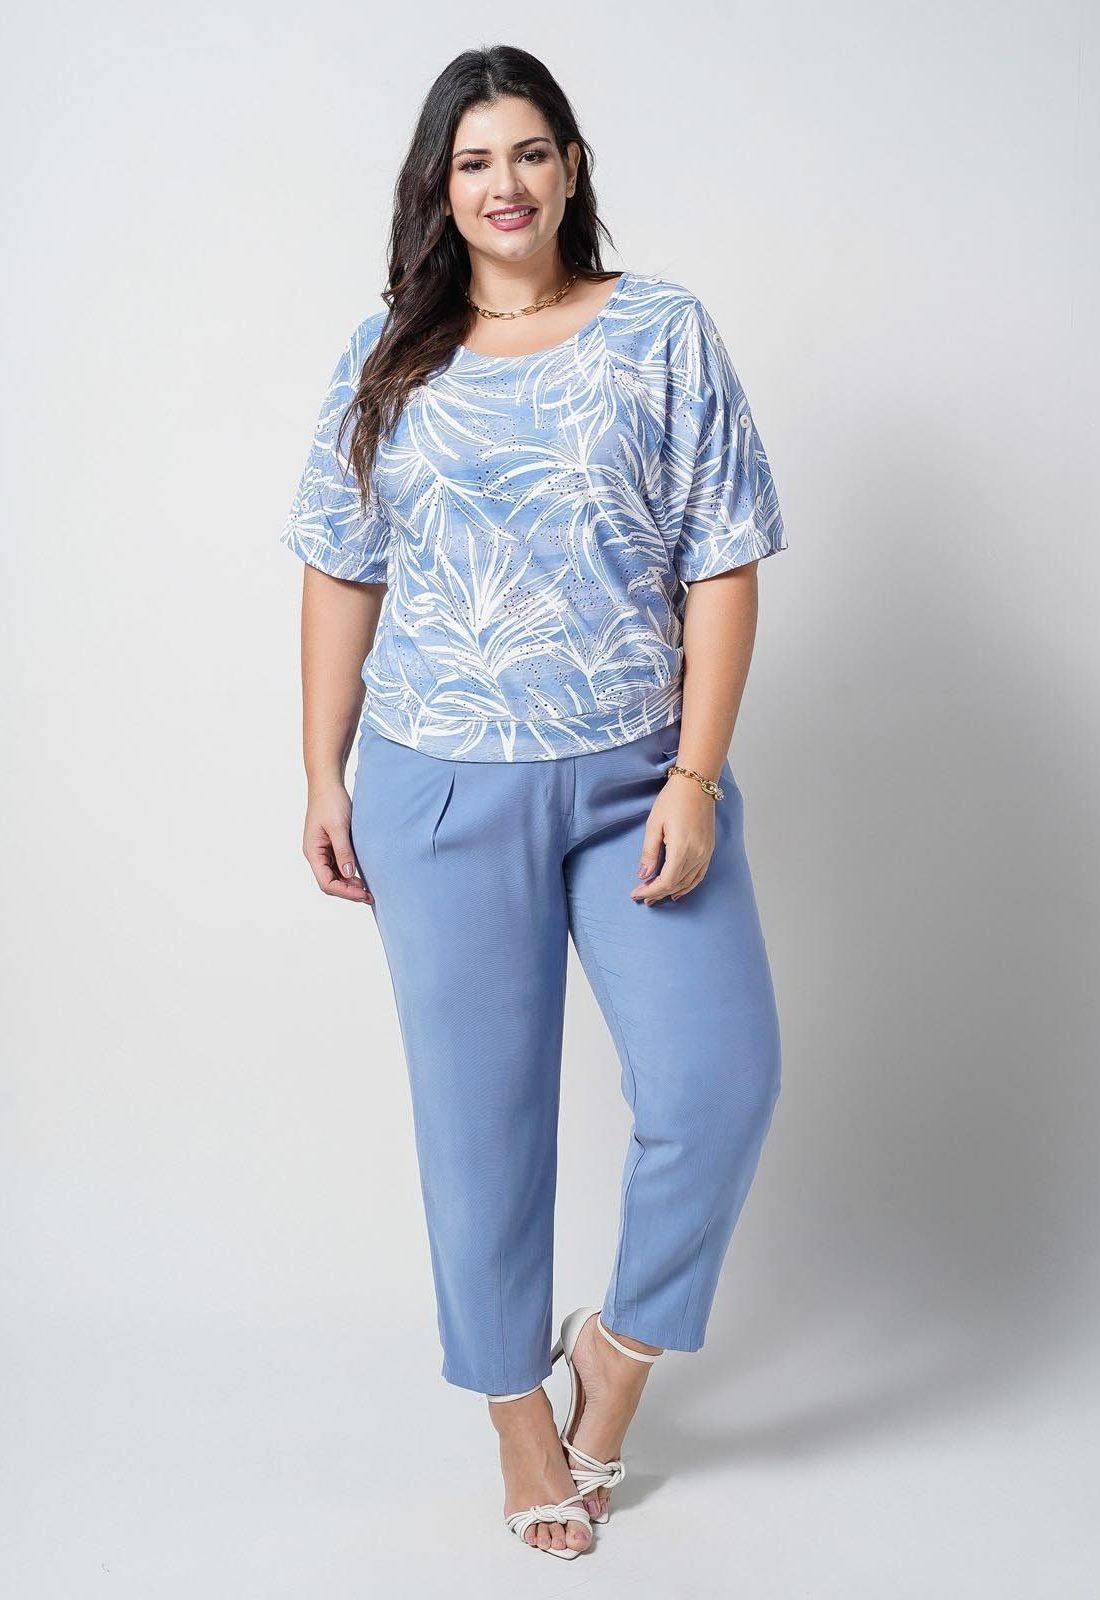 Blusa azul laise de malha  plus size  Ref. U66321